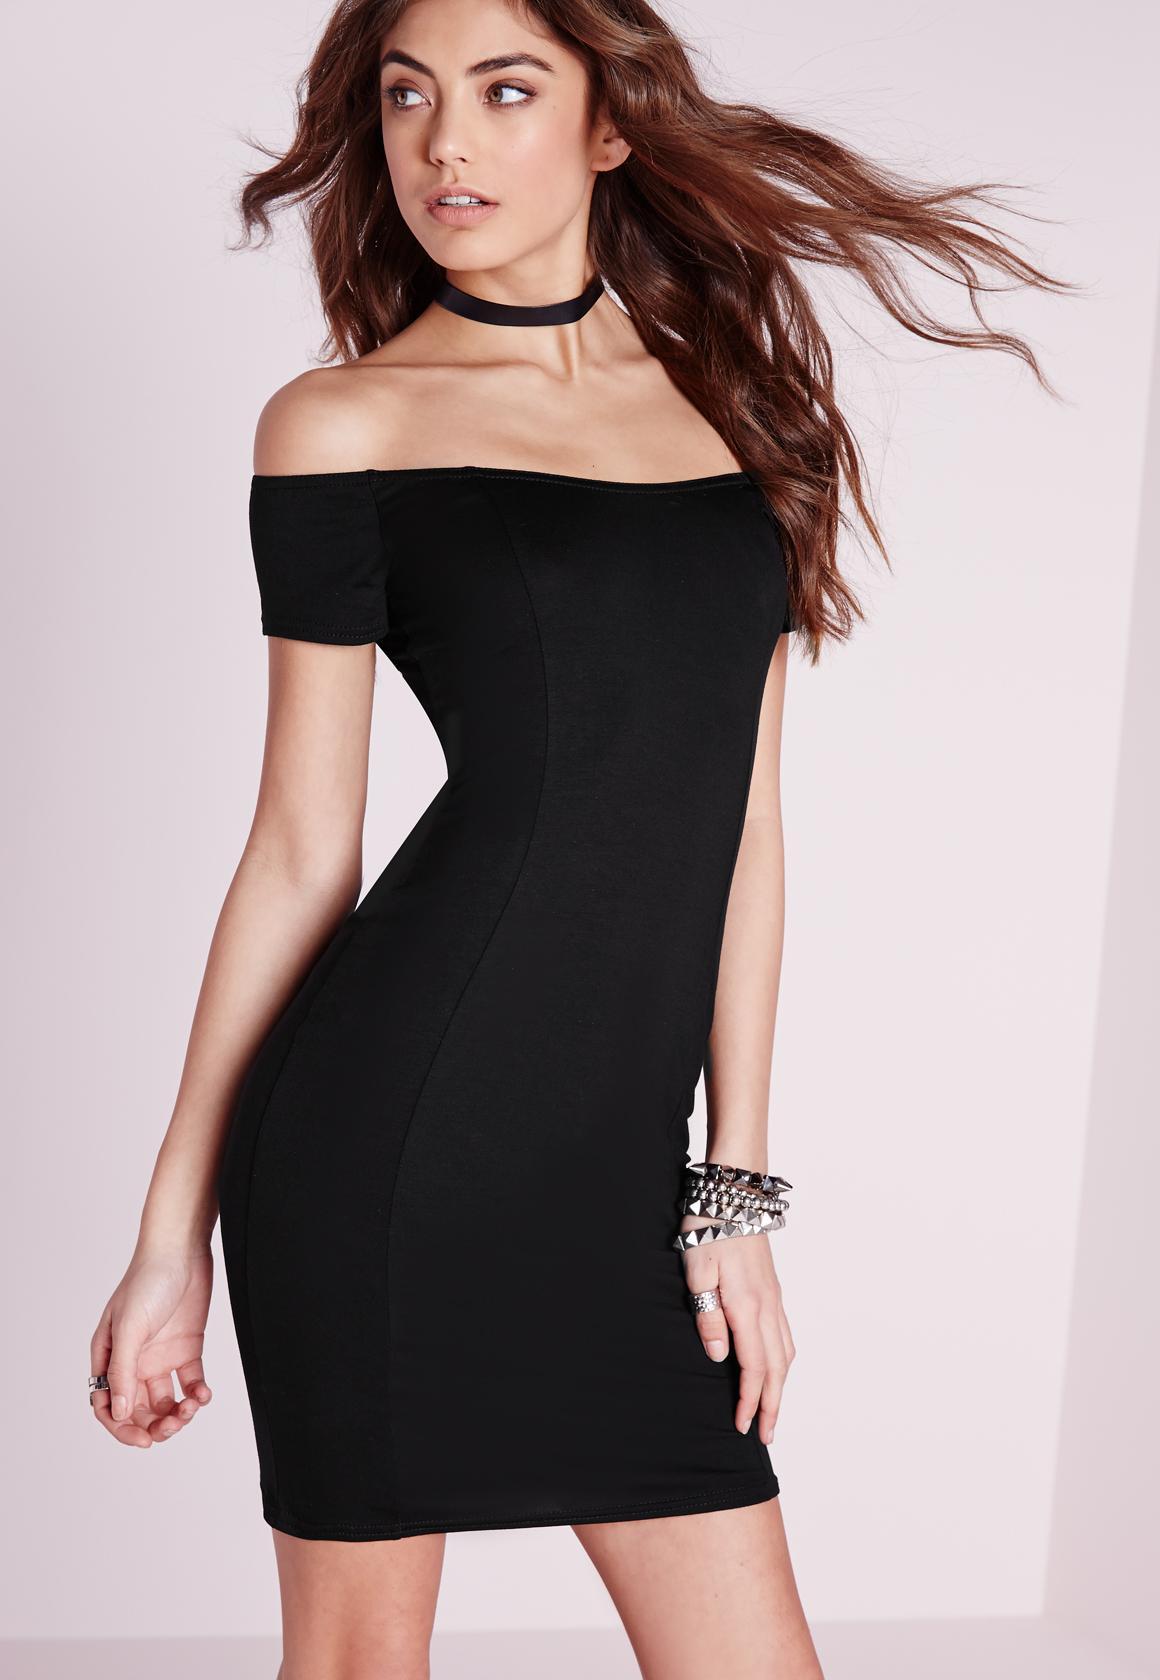 Black dress jersey - Jersey Bardot Bodycon Dress Black